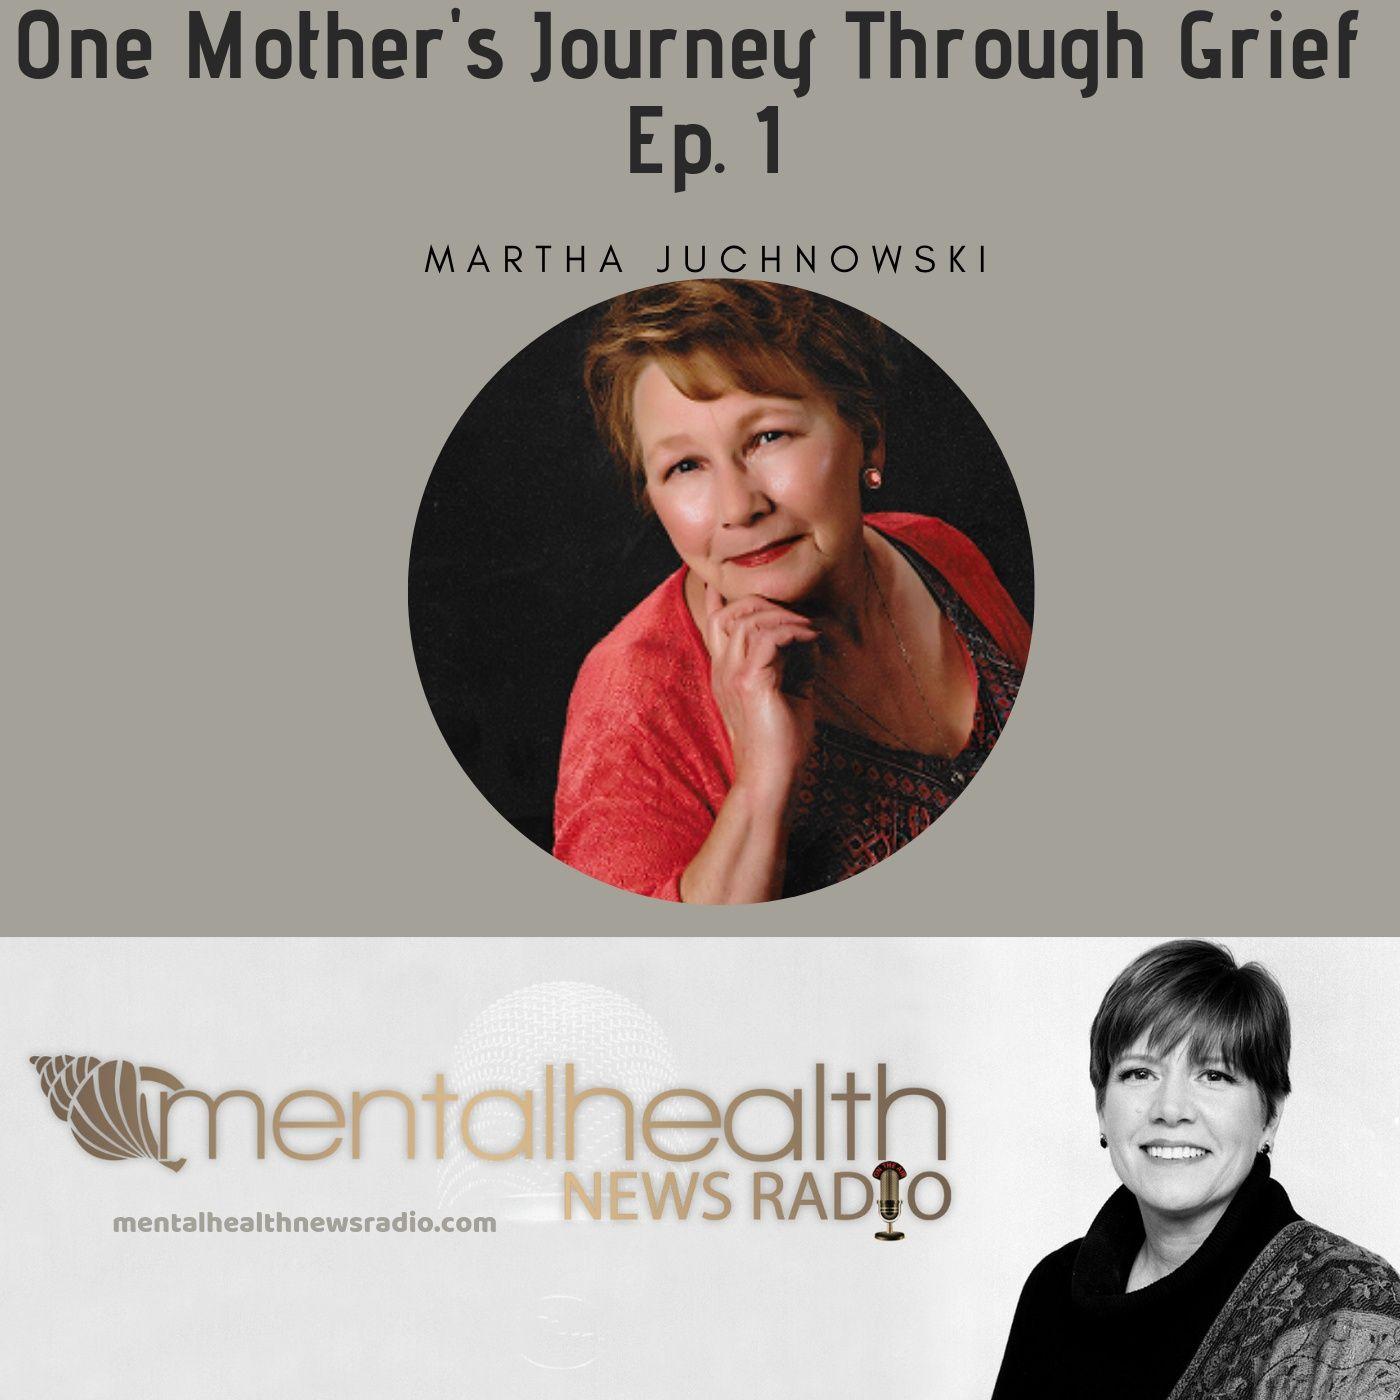 Mental Health News Radio - One Mother's Journey Through Grief with Martha Juchnowski